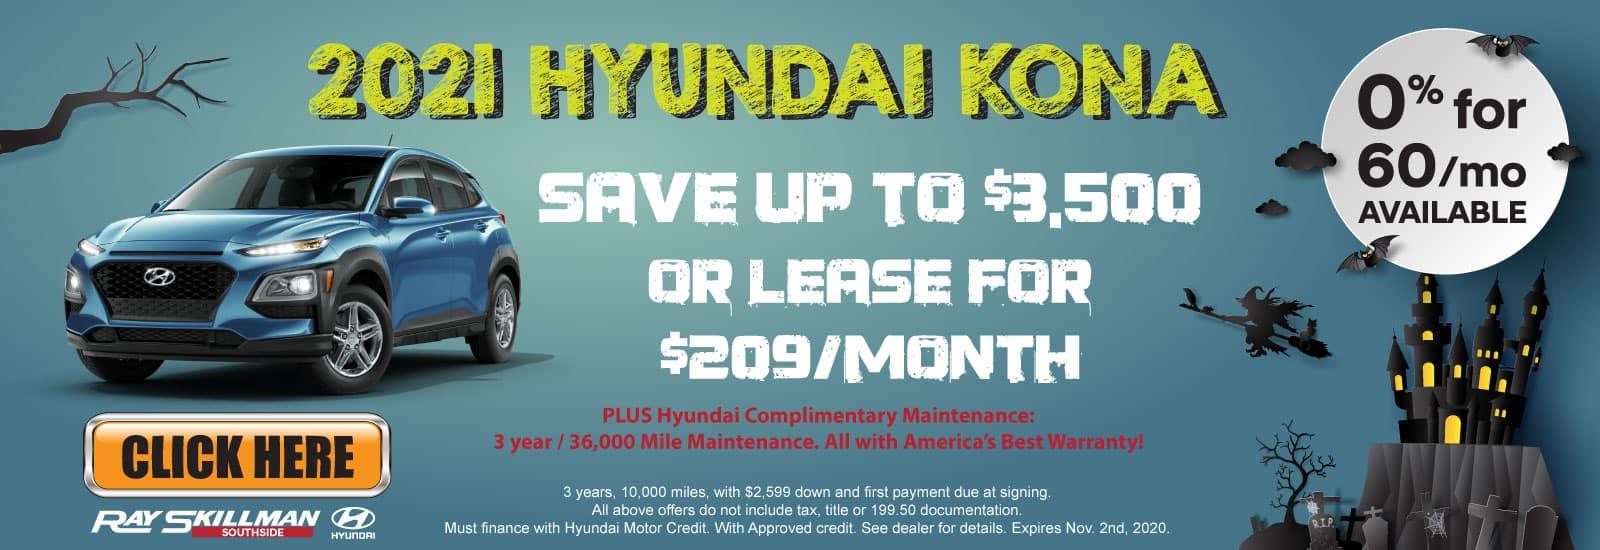 2020-Hyundai-Kona-Web-Banner-1600×550